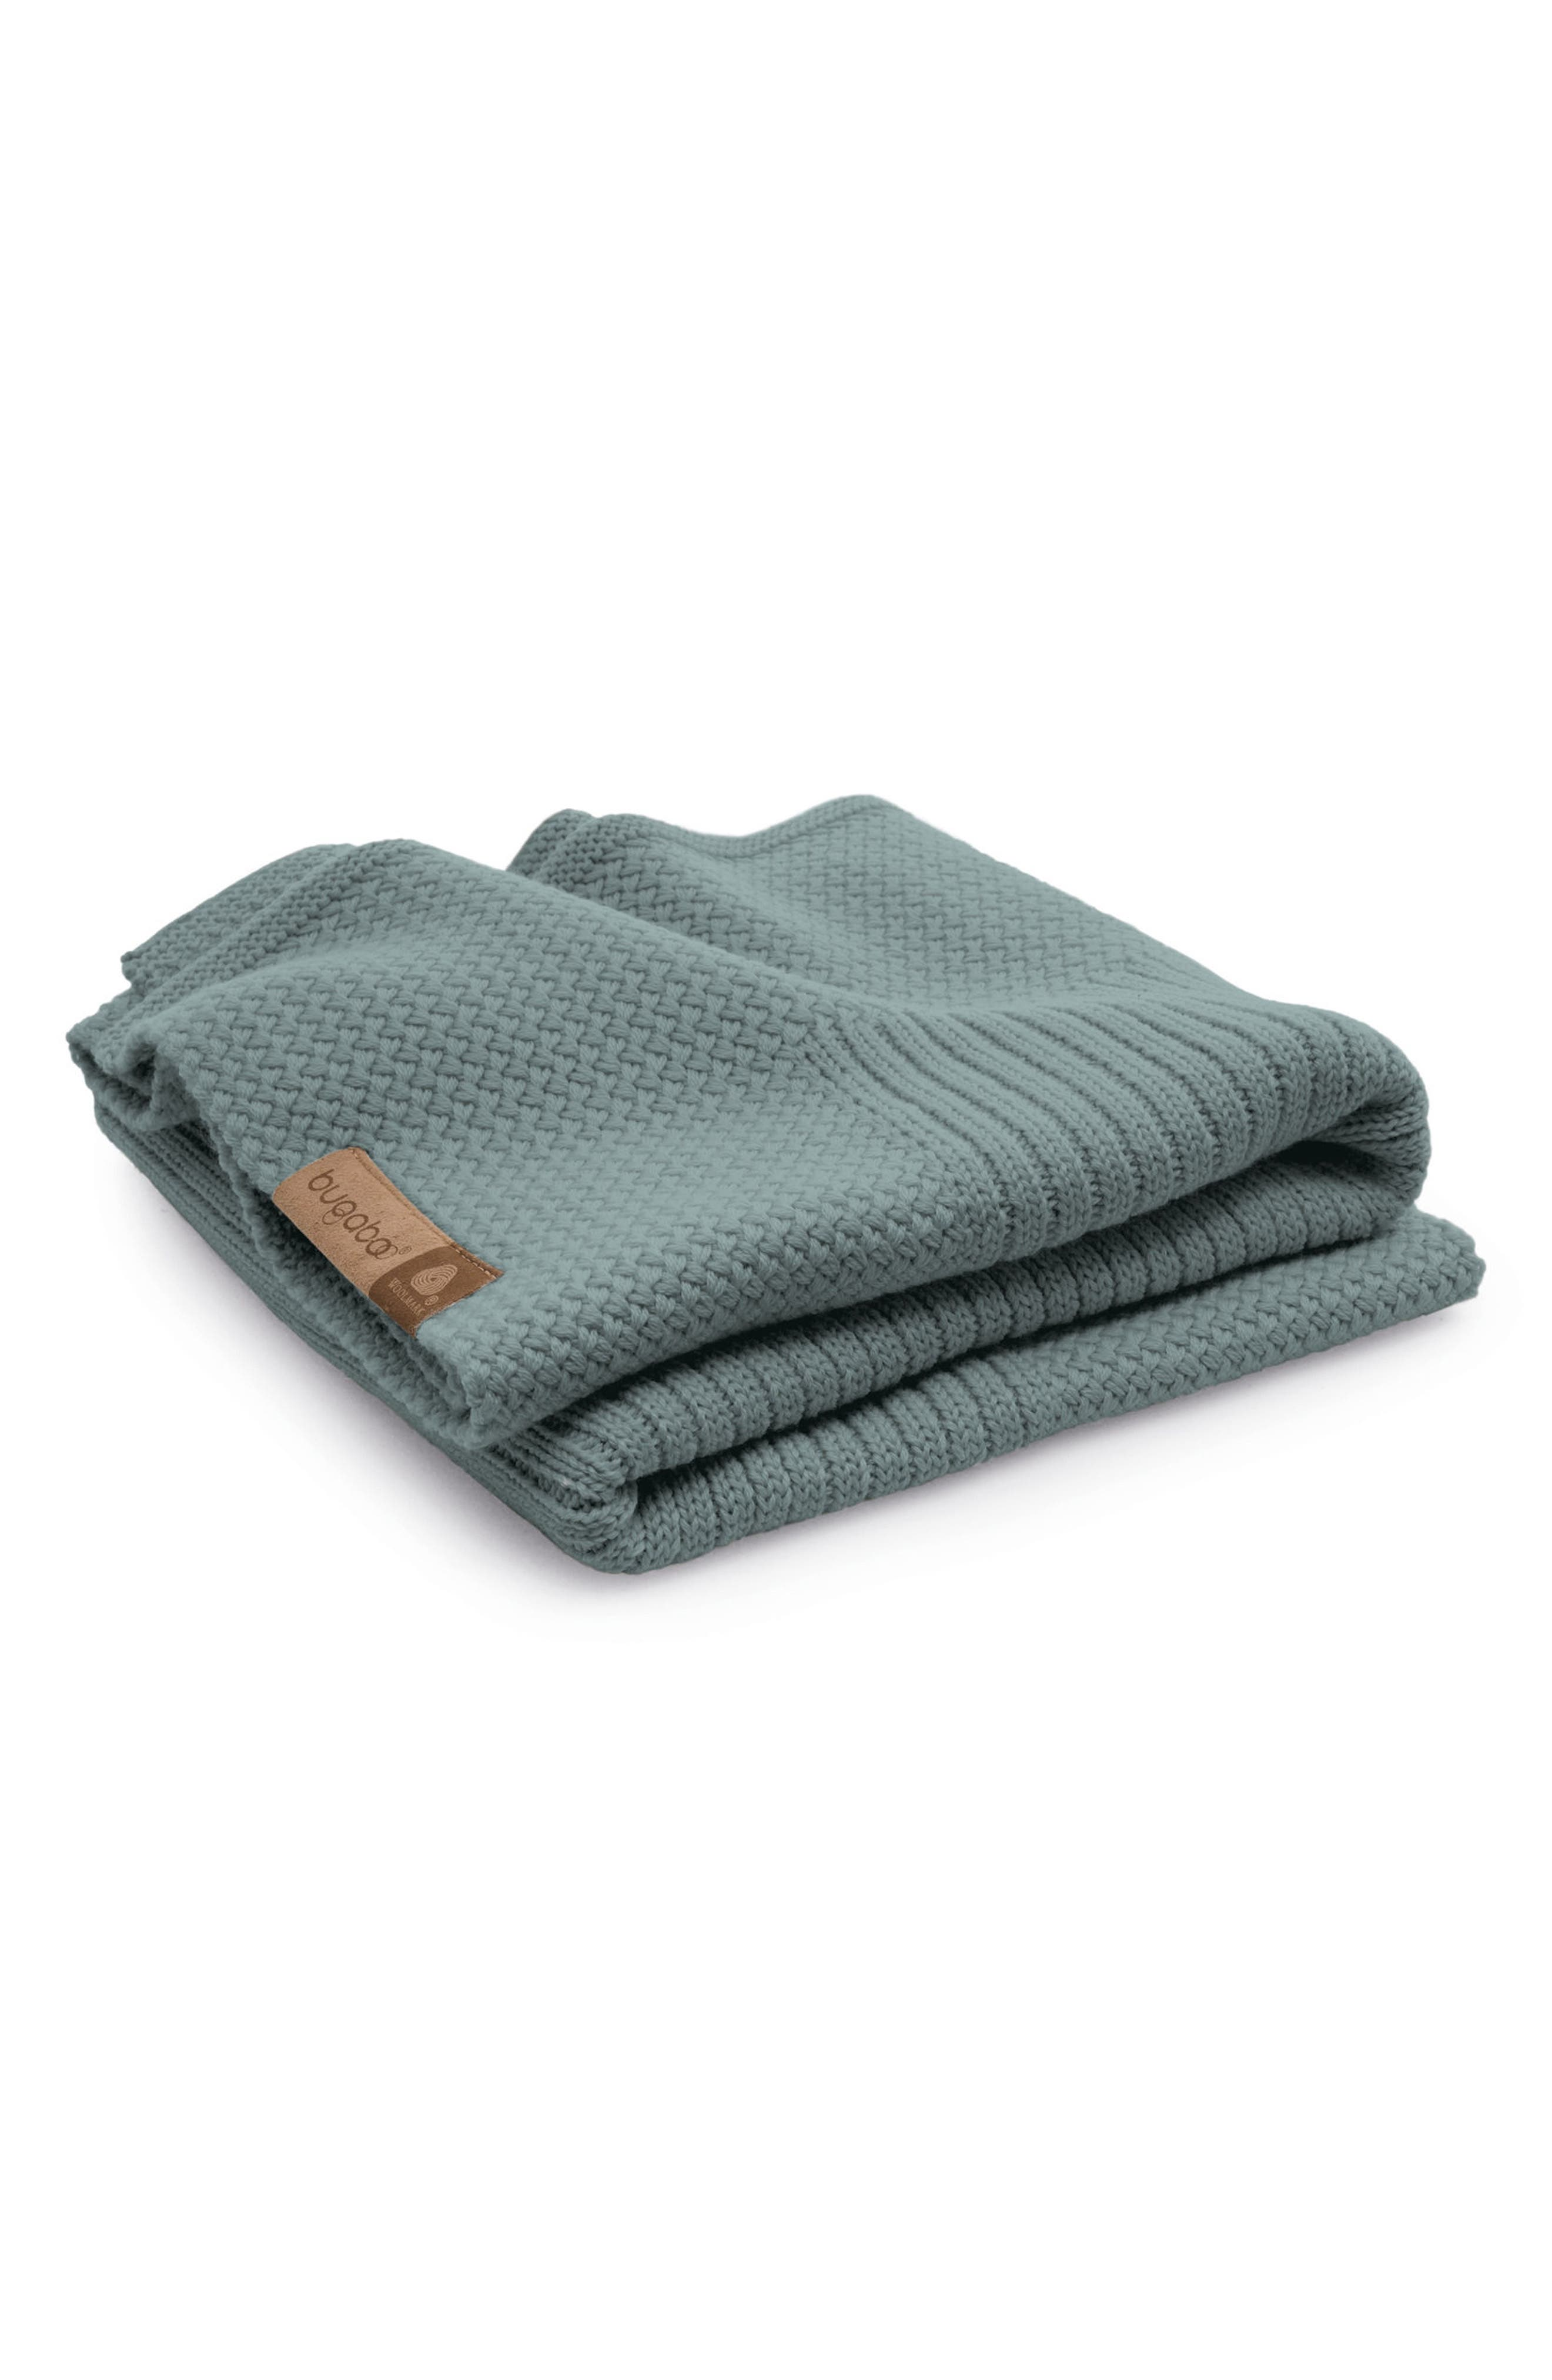 Soft Wool Blanket,                             Main thumbnail 1, color,                             PETROL BLUE